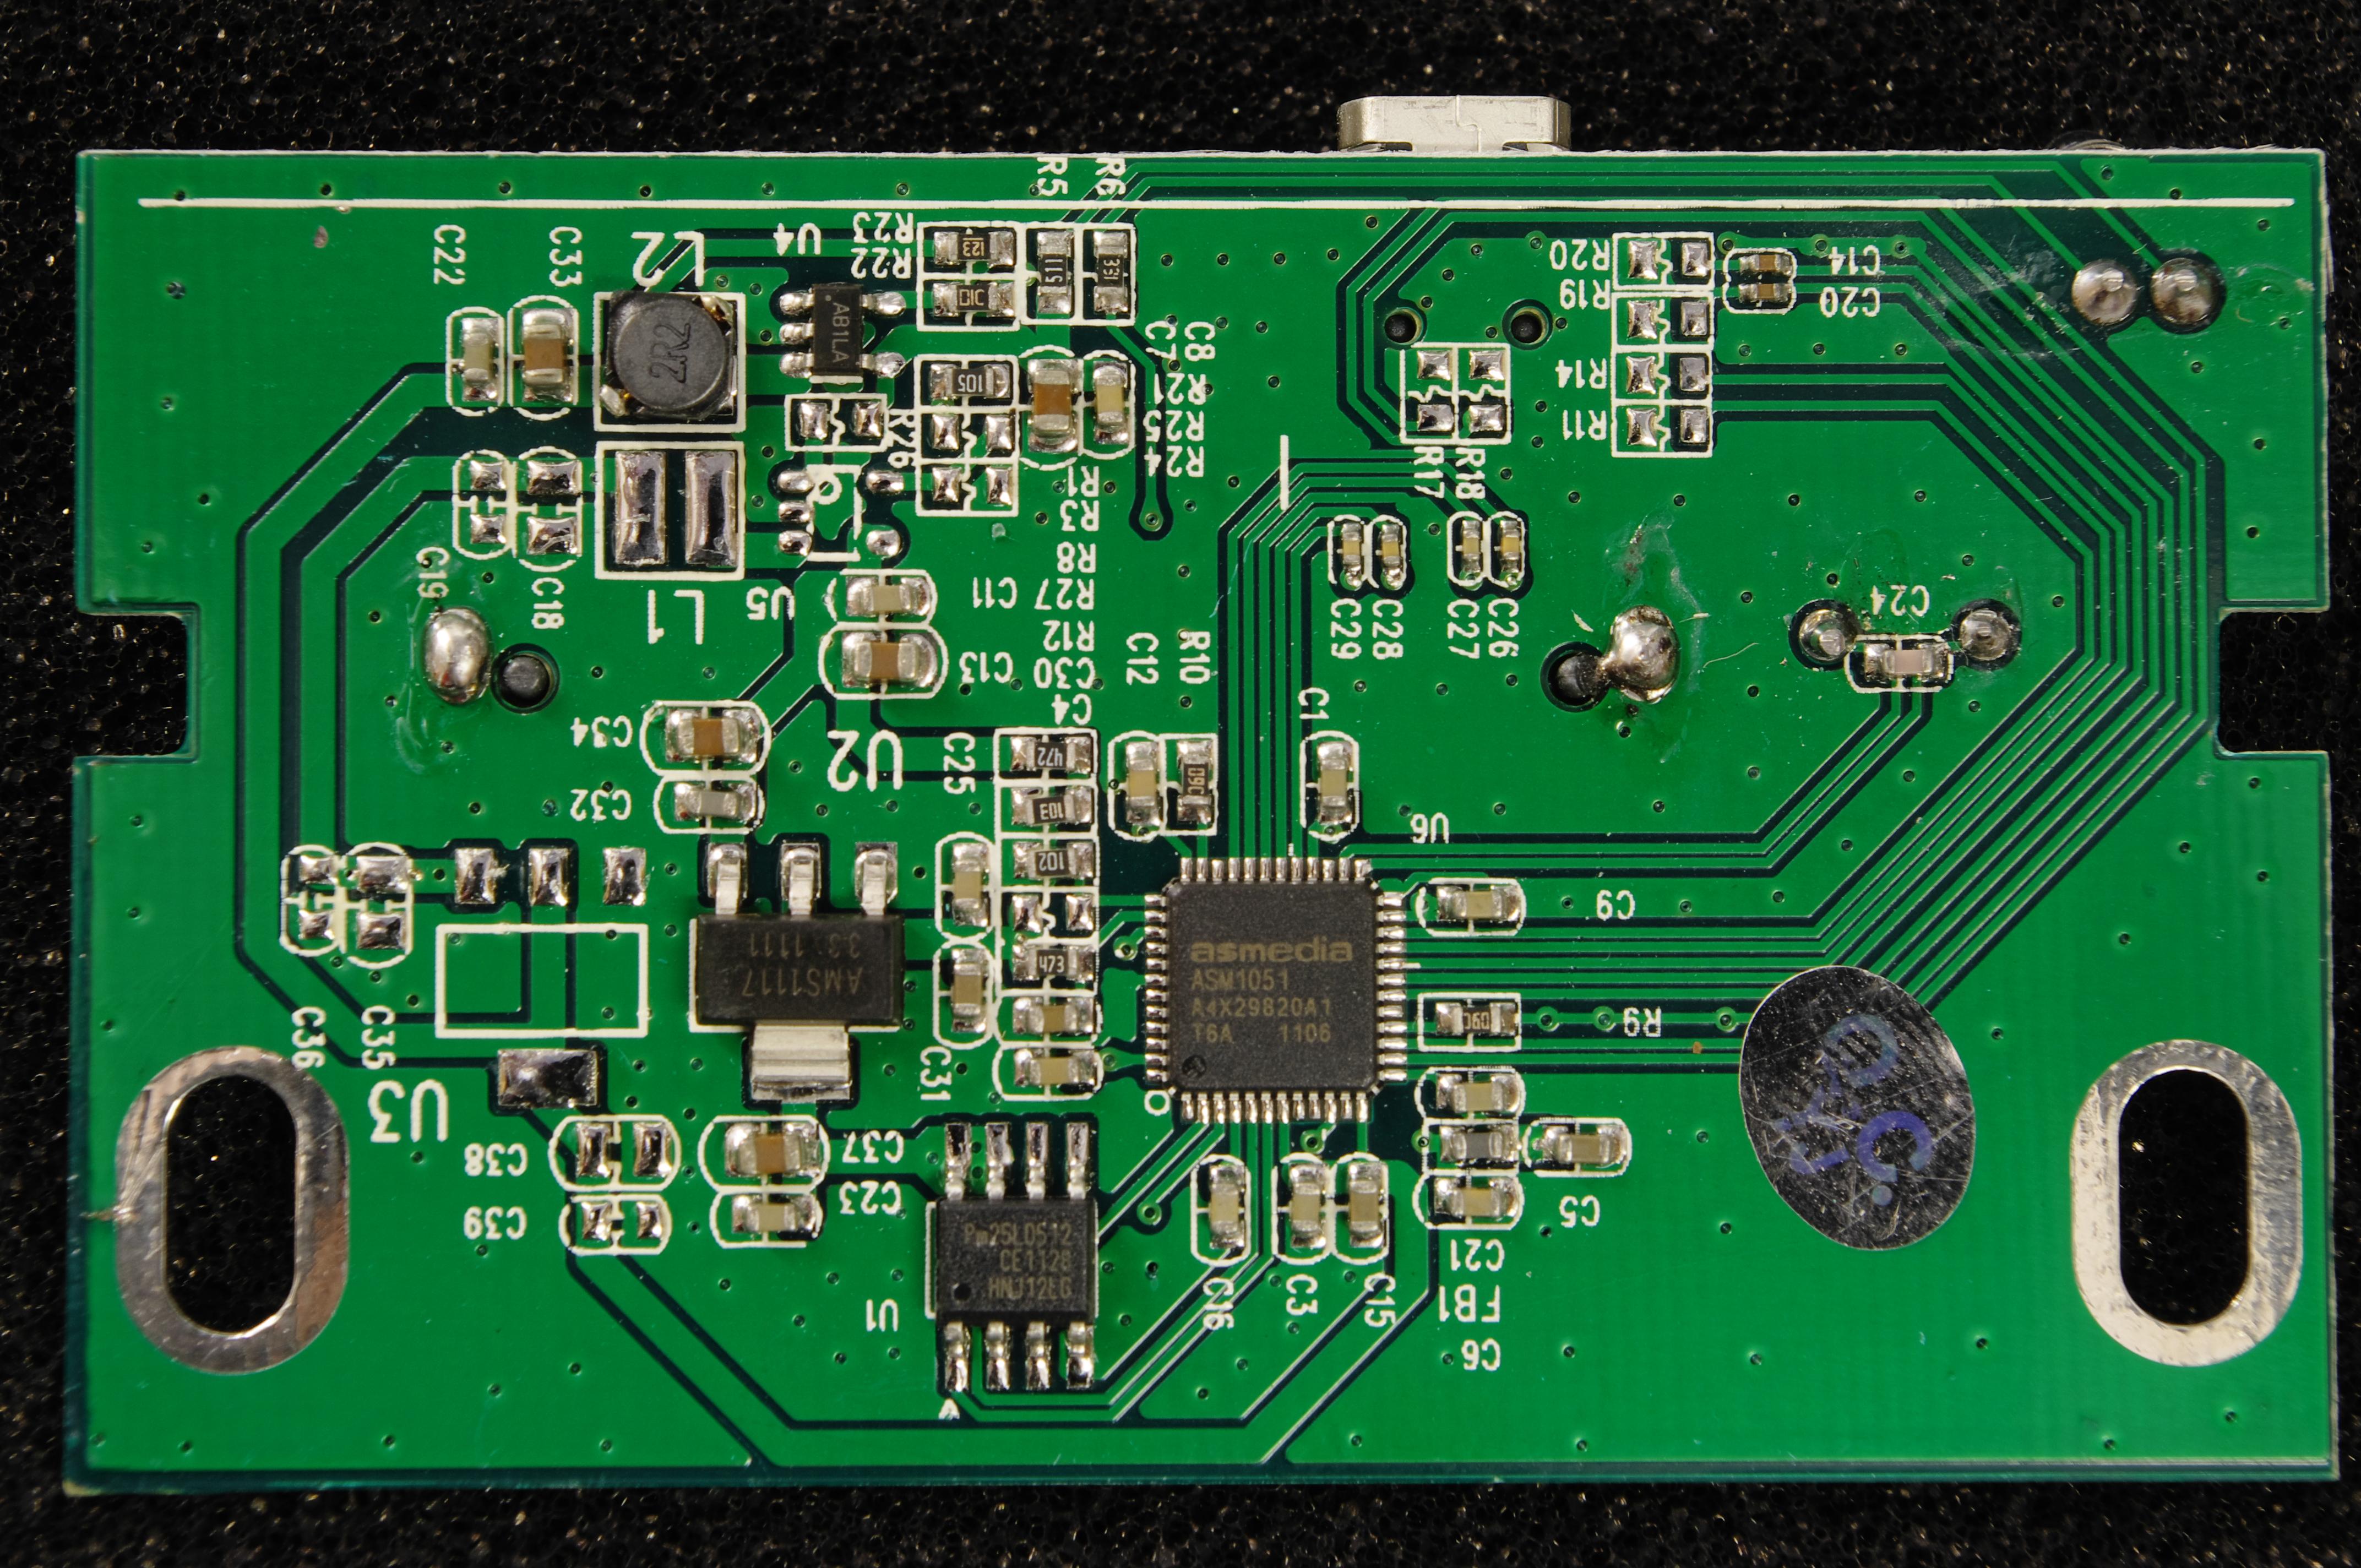 USB3 PINOUT PINOUT 0 - ELECTRIC MX TL on vga wiring diagram, firewire wiring diagram, atx wiring diagram, software wiring diagram, ethernet wiring diagram, esata wiring diagram, audio wiring diagram, sata wiring diagram, apple wiring diagram, power wiring diagram, ipad wiring diagram, fast wiring diagram, dvi wiring diagram, pci express wiring diagram, thunderbolt wiring diagram, fans wiring diagram, camera wiring diagram, wifi wiring diagram,